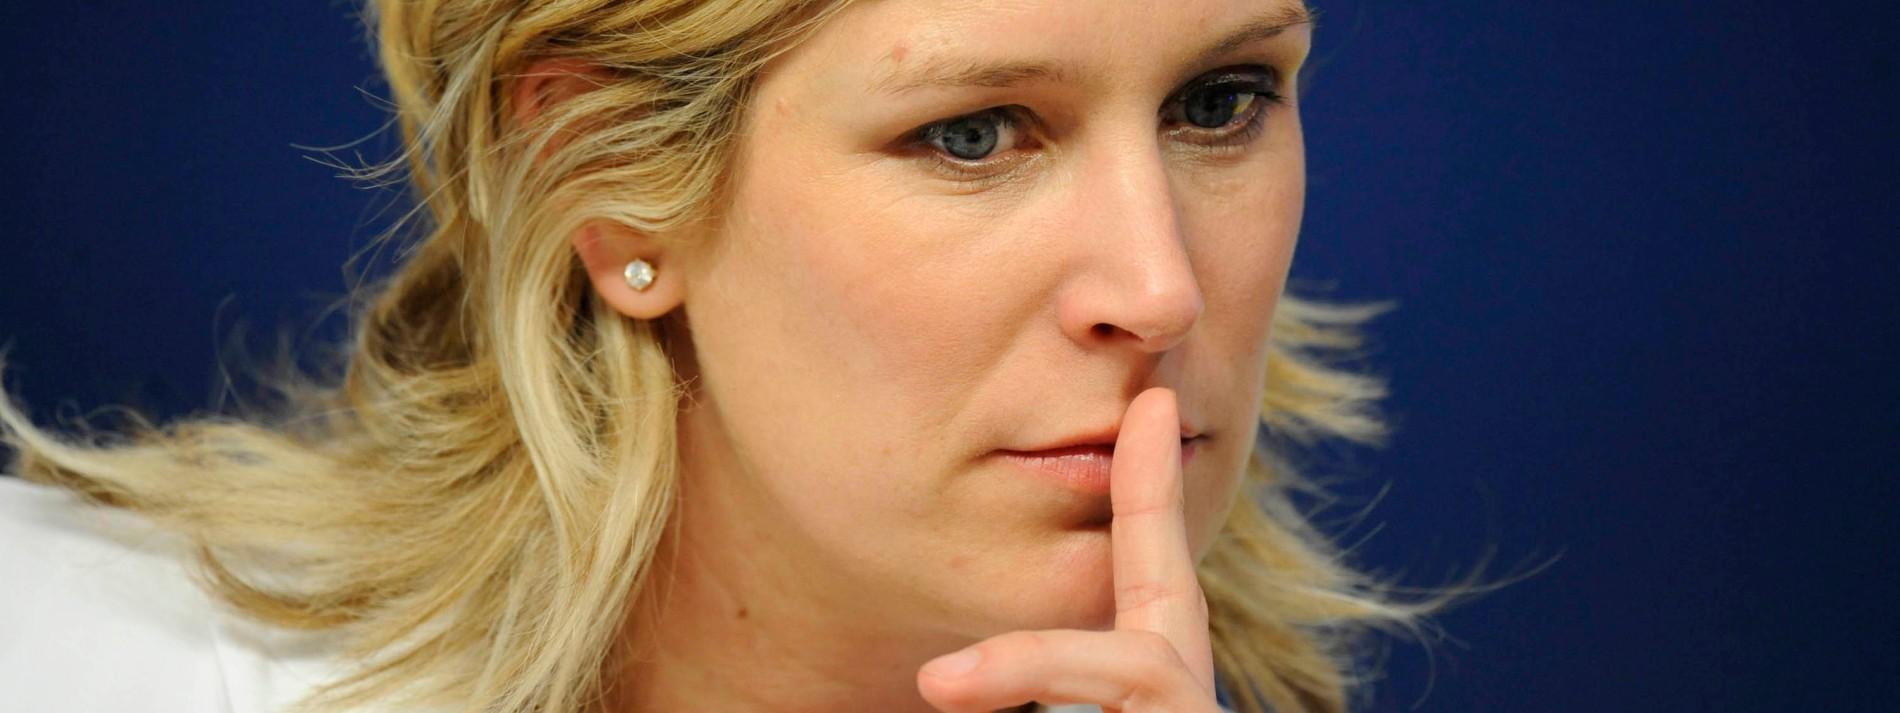 Koch-Mehrin verliert Kampf um Doktortitel